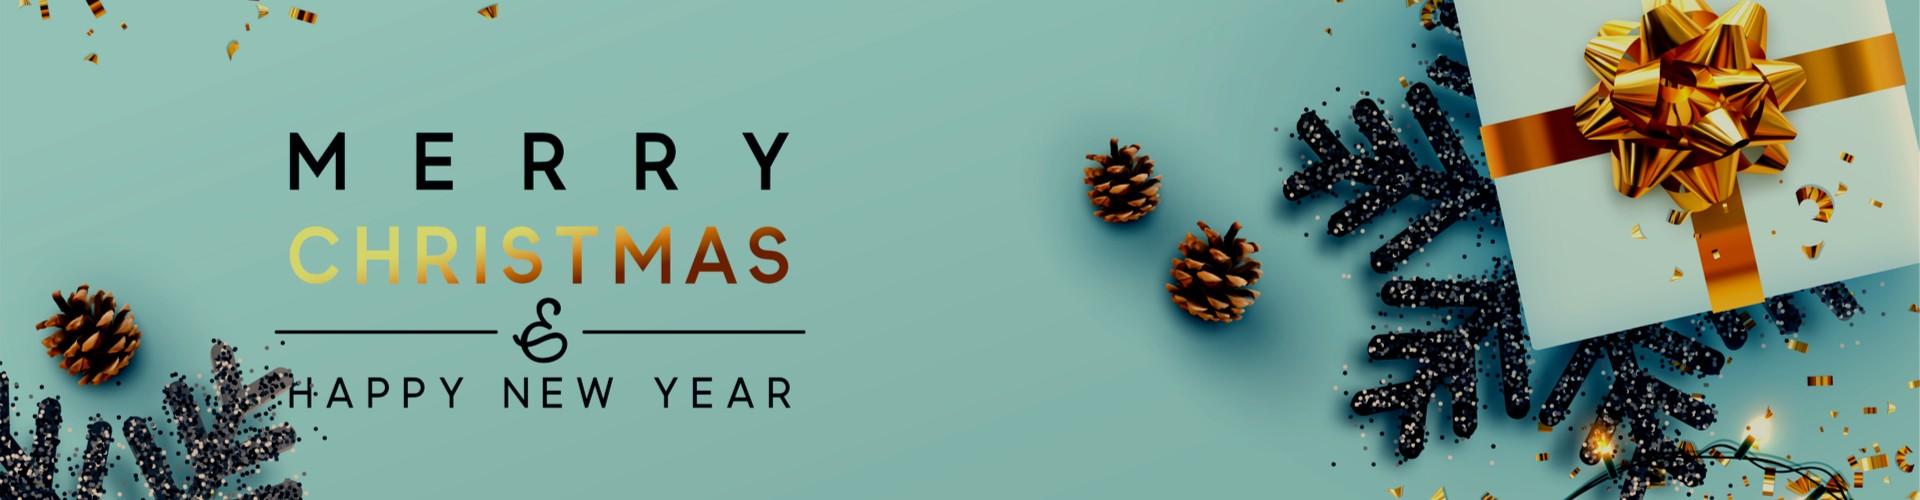 MERRY CHRISTMAS - MUNDOVINUM